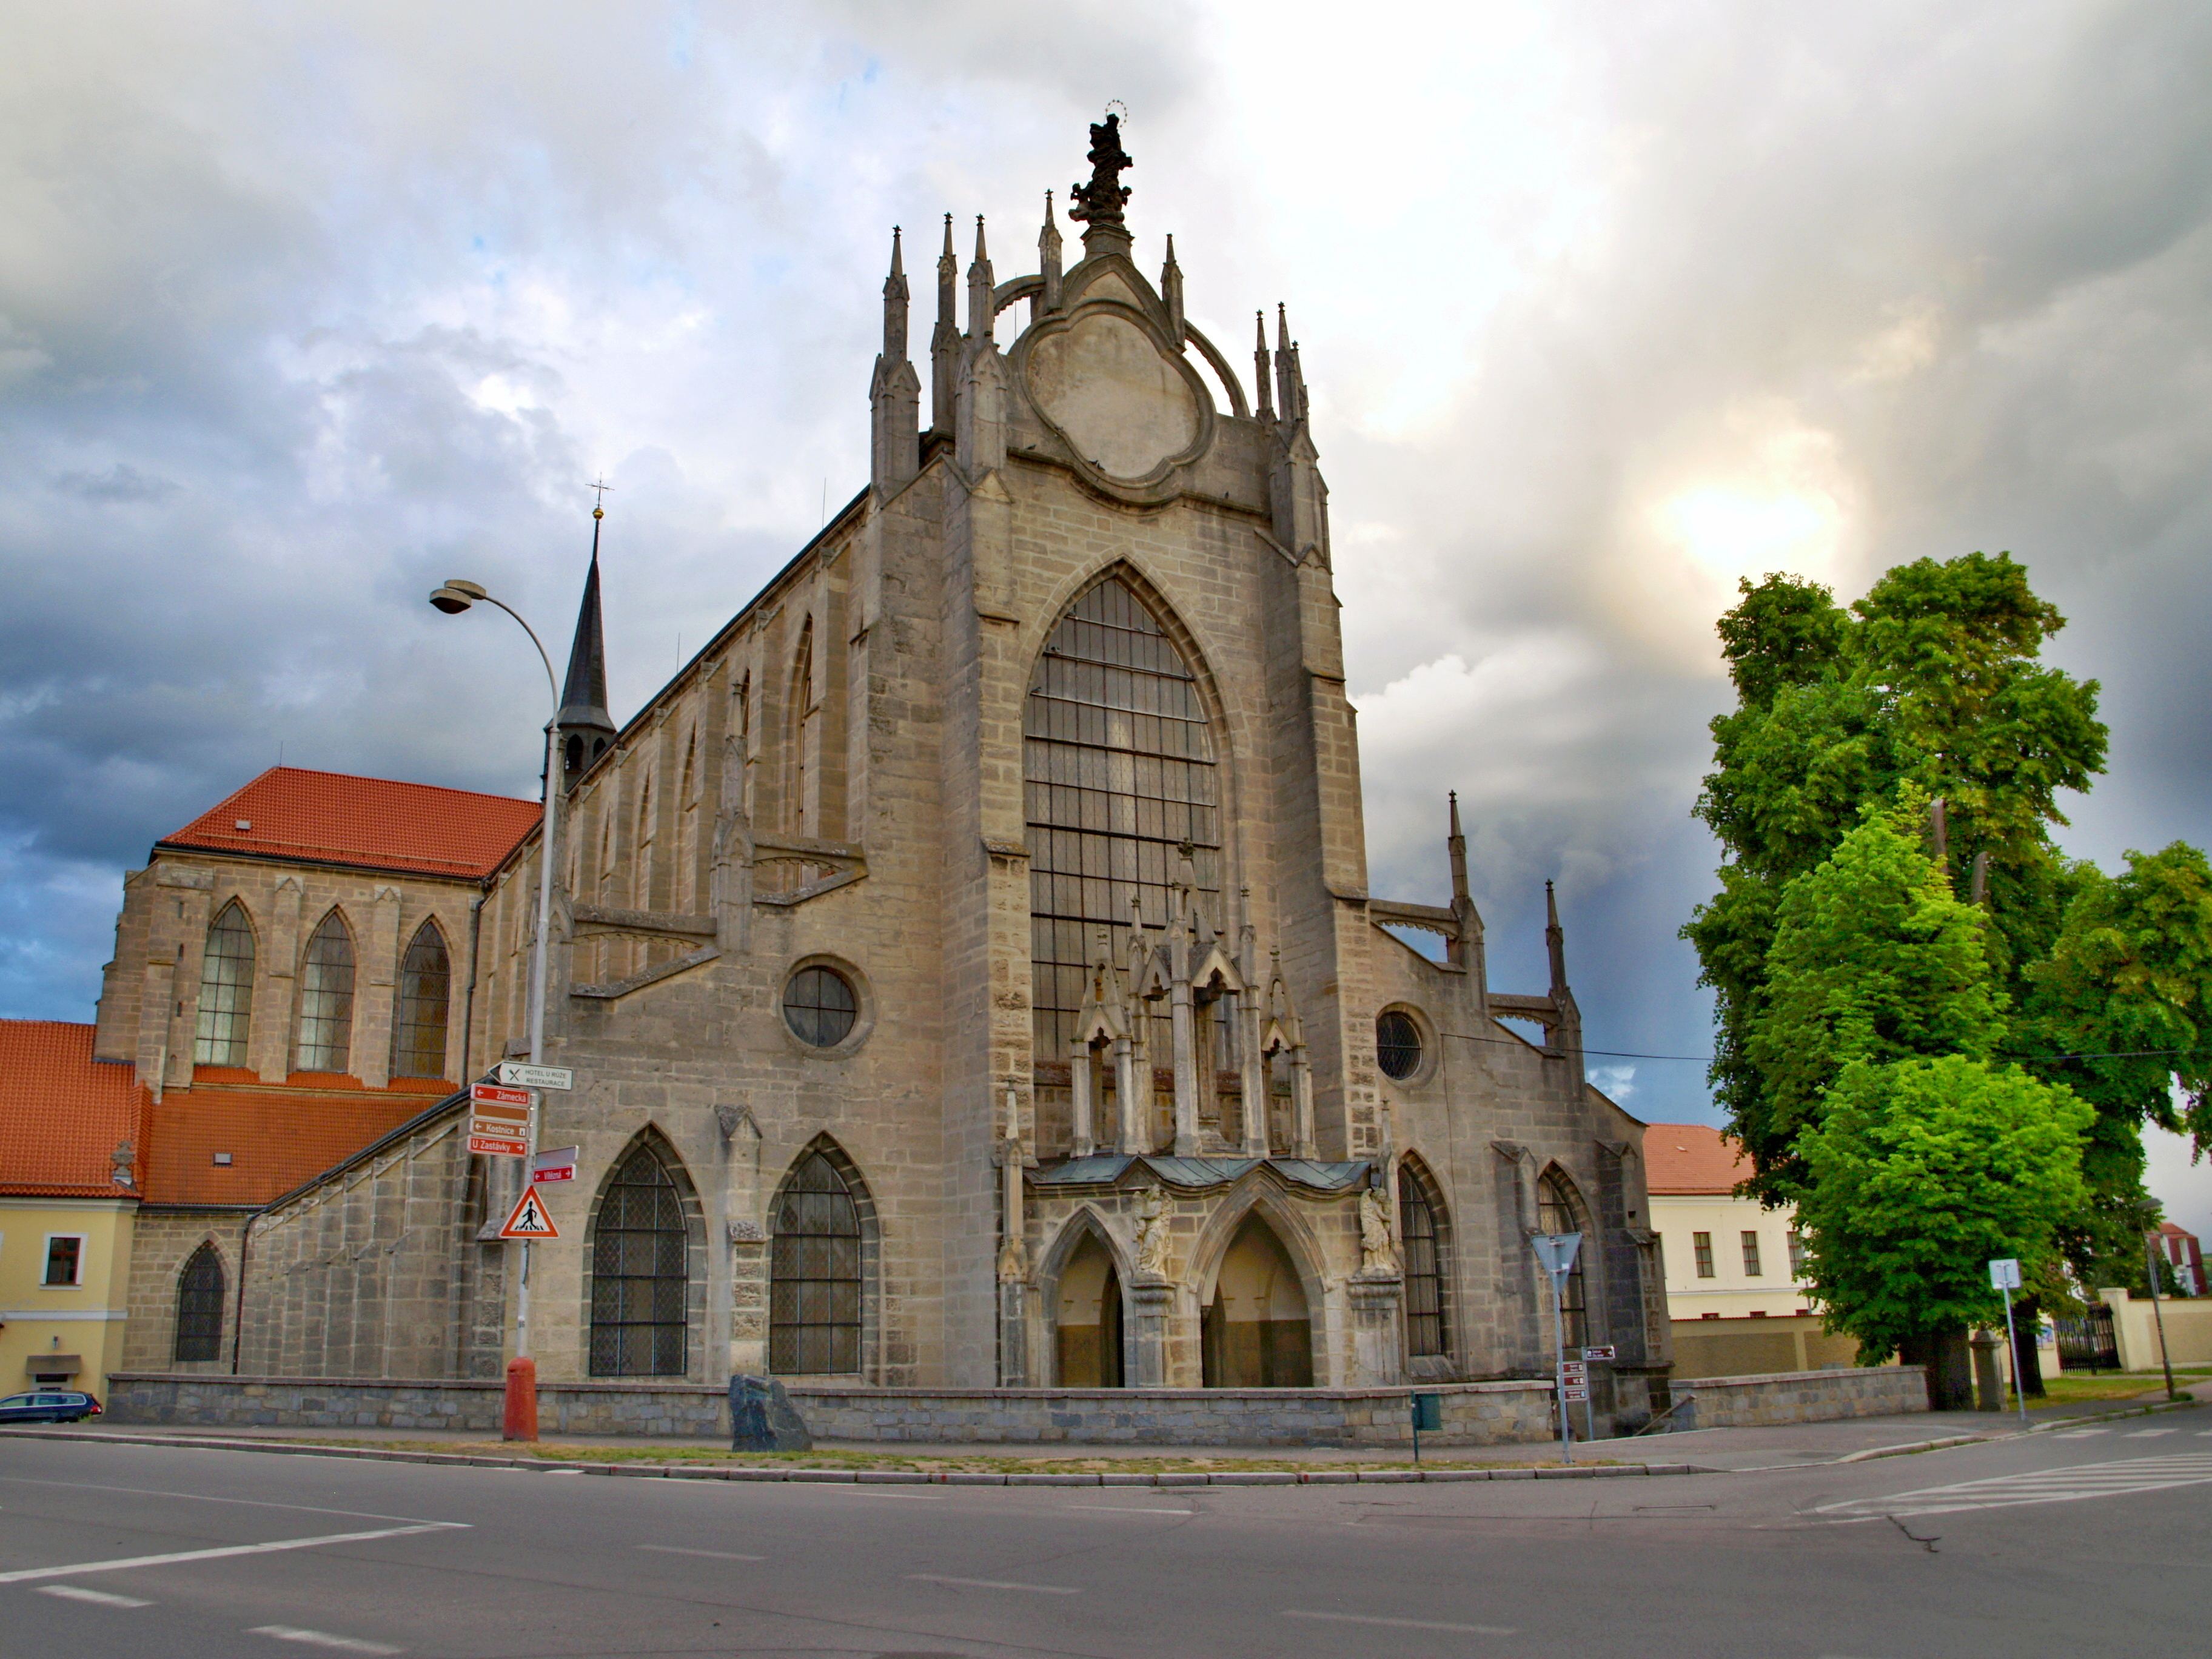 5594-katedrala-nanebevzeti-panny-marie-a-sv-jana-krtitele-cathedral-of-assumption-of-our-lady-and-st-john-the-baptist.jpg